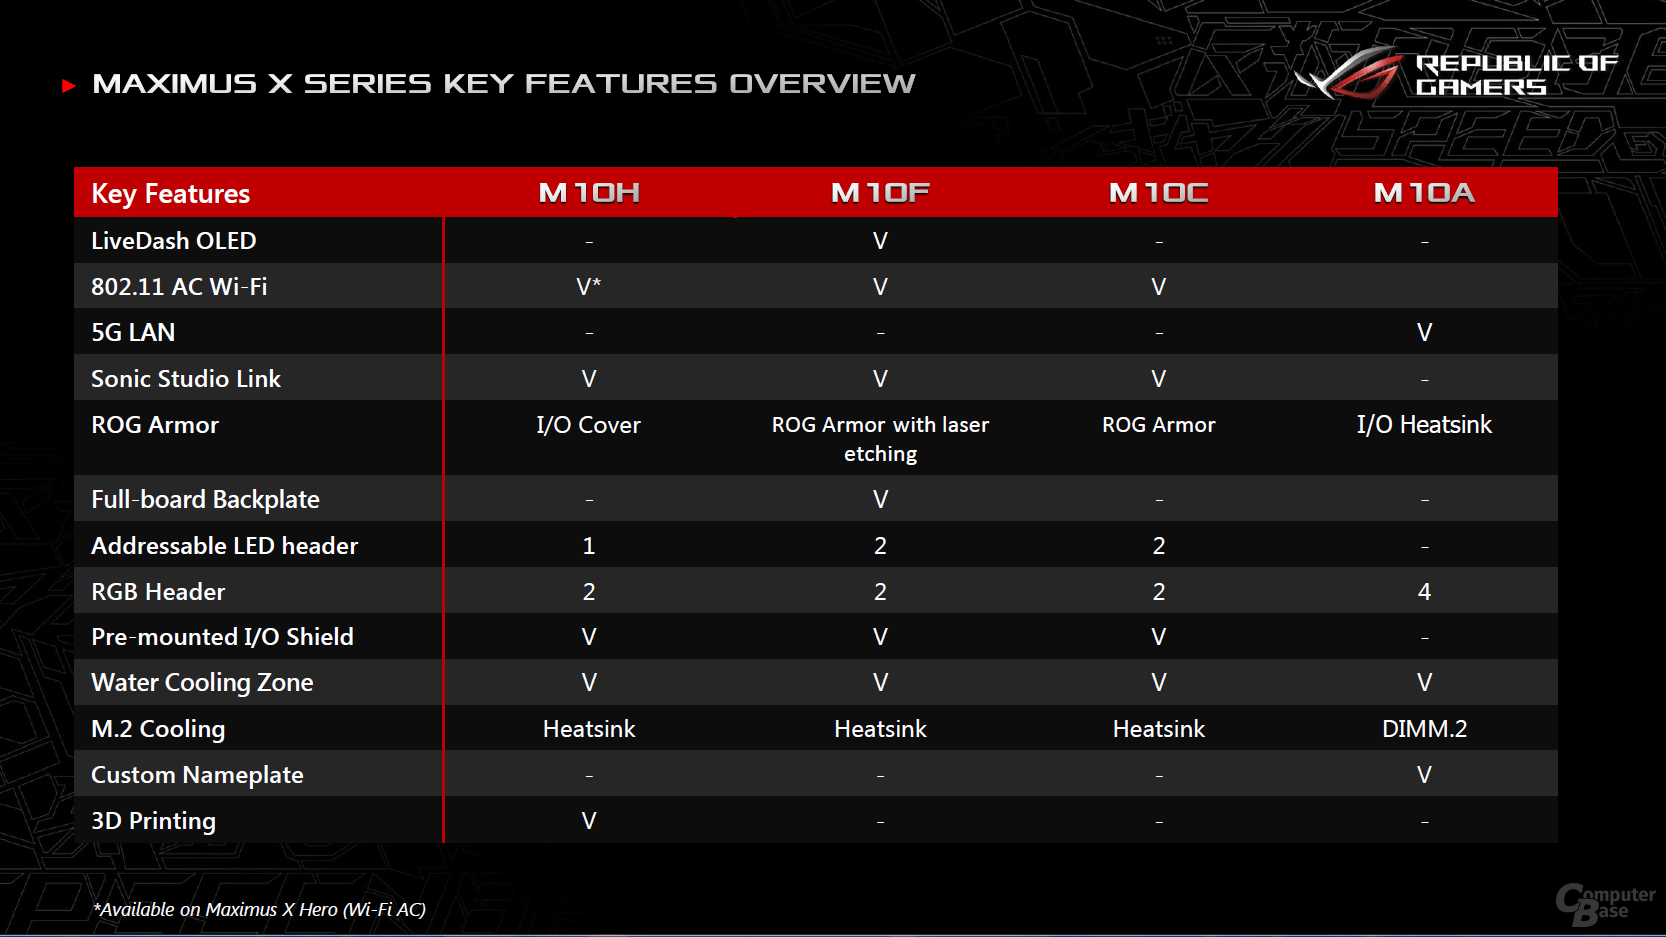 Maximus-X-Serie in 4 Klassen mit 5 Boards